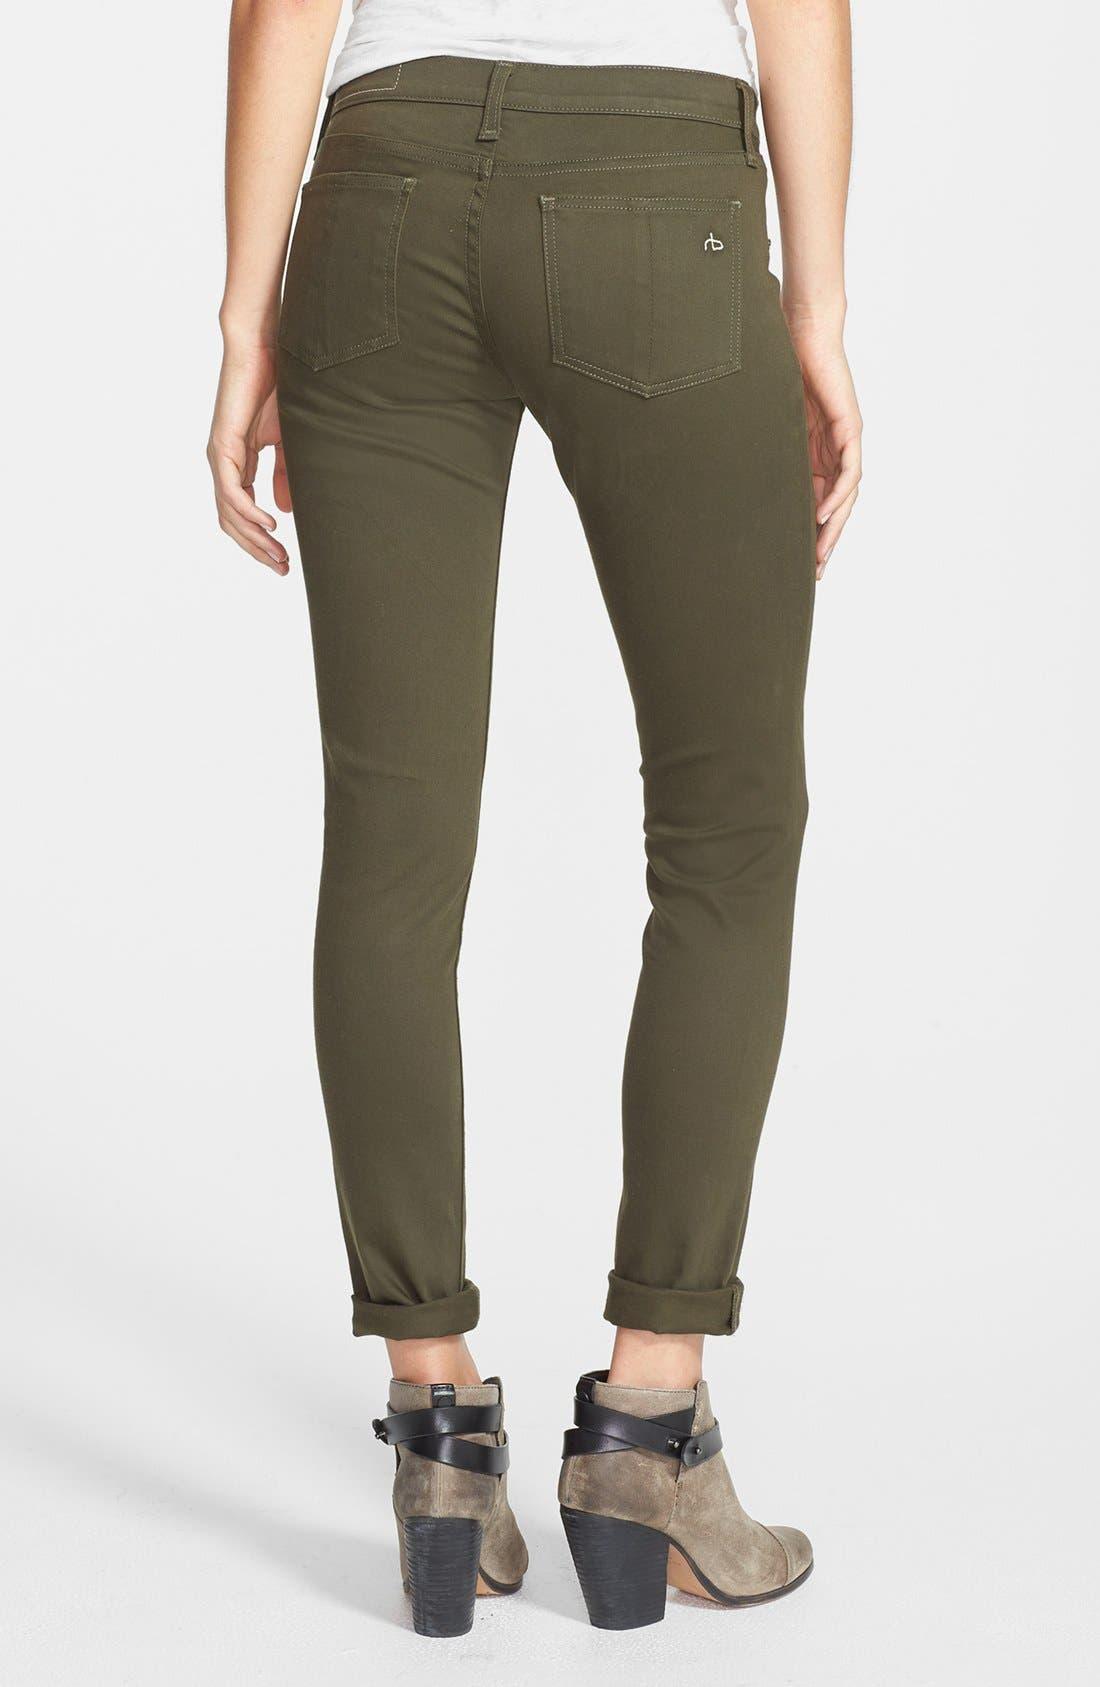 Alternate Image 2  - rag & bone/JEAN 'The Legging' Sateen Skinny Jeans (Army Sateen)